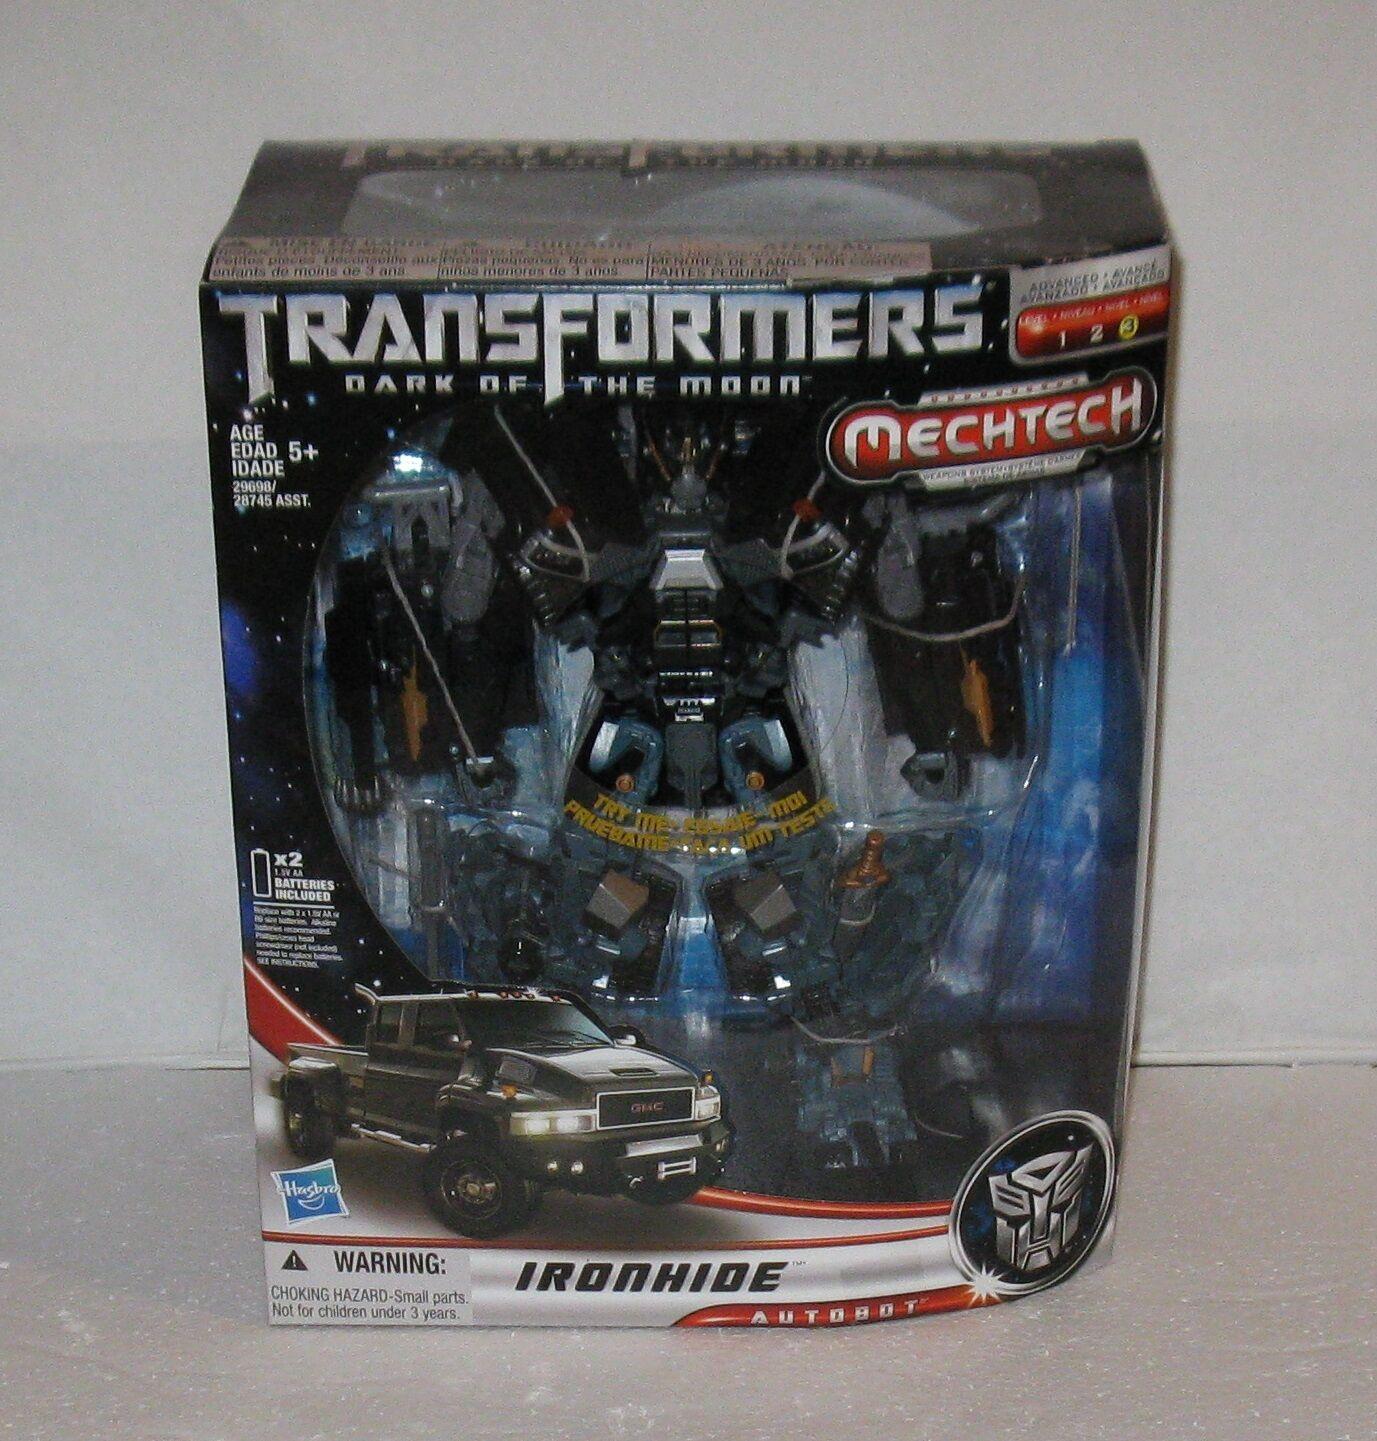 Seltene transformatoren mechtech ironhide autobot - mb 2010 versandkosten